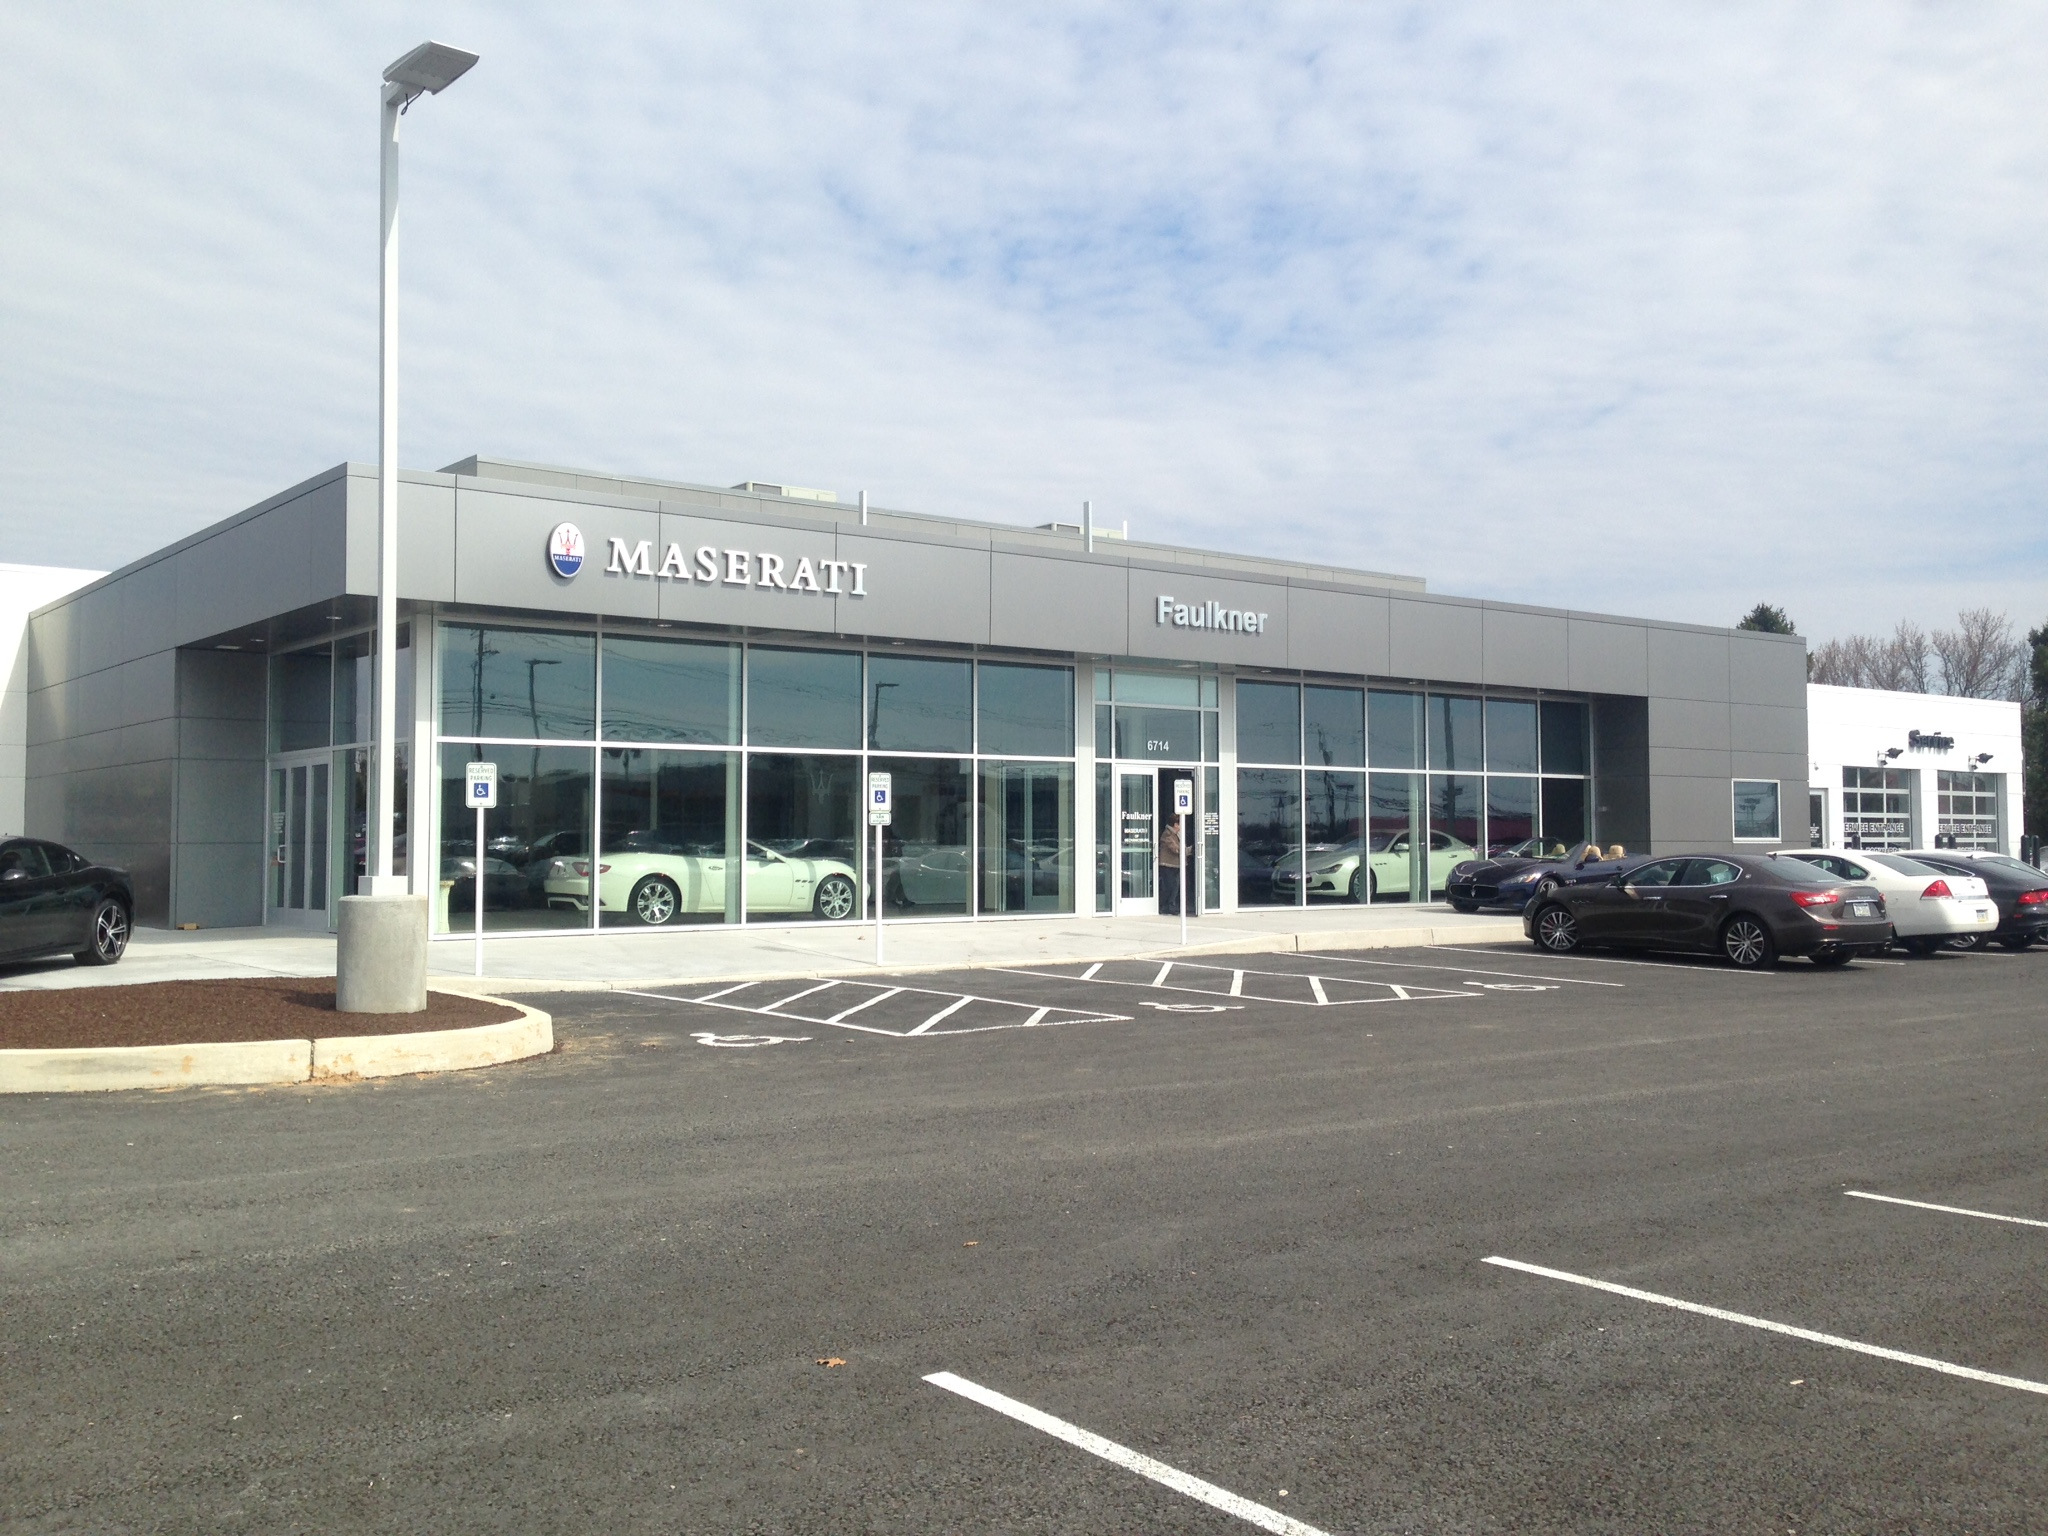 Faulkner Maserati, Mechanicsburg, PA